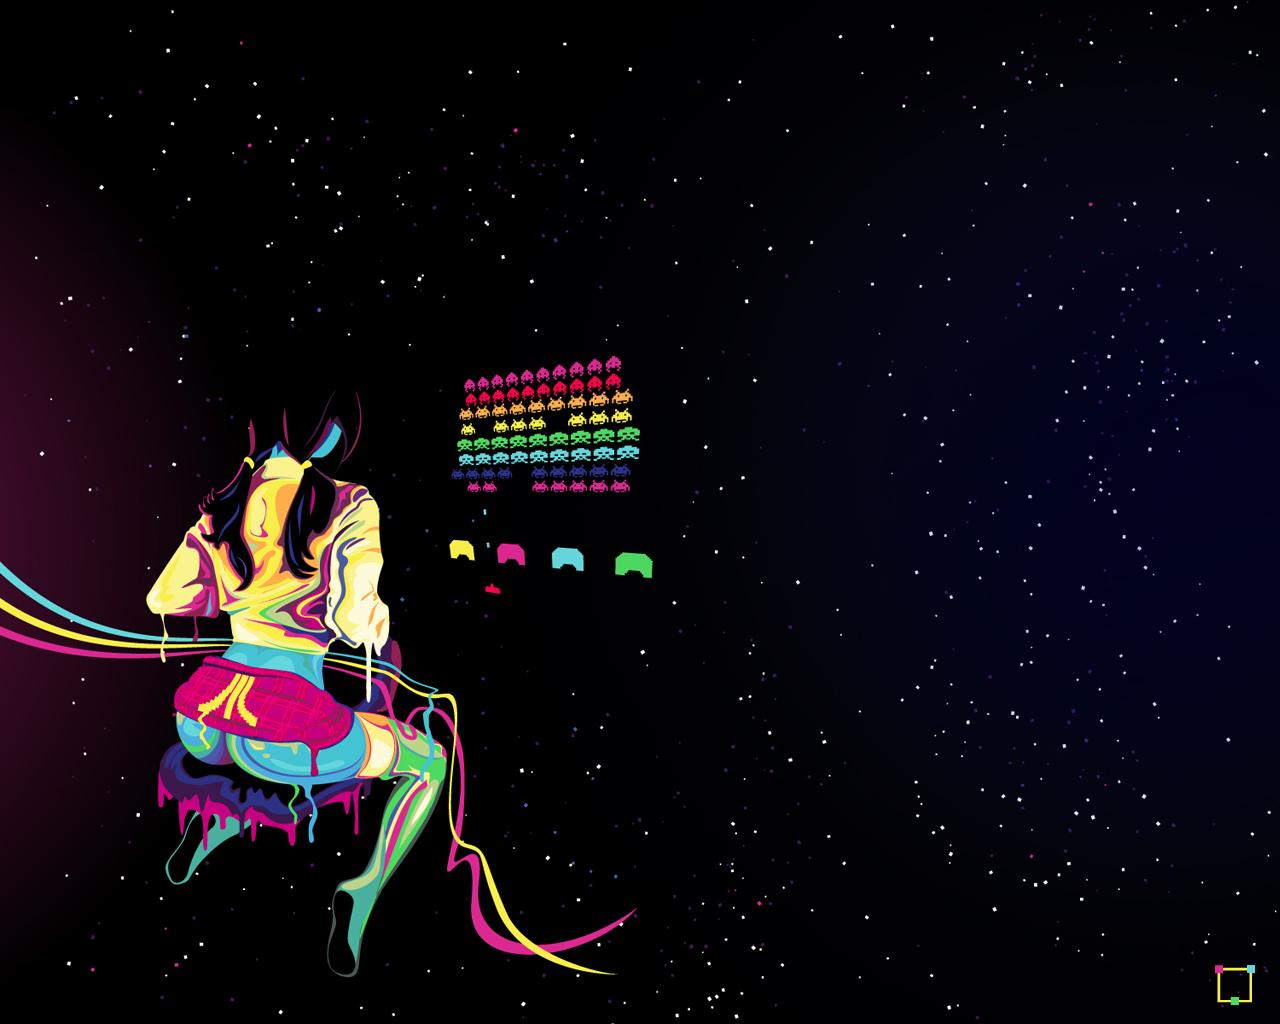 Genaro Desia Coppola Atari Is Hot Vector Art Wallpaper